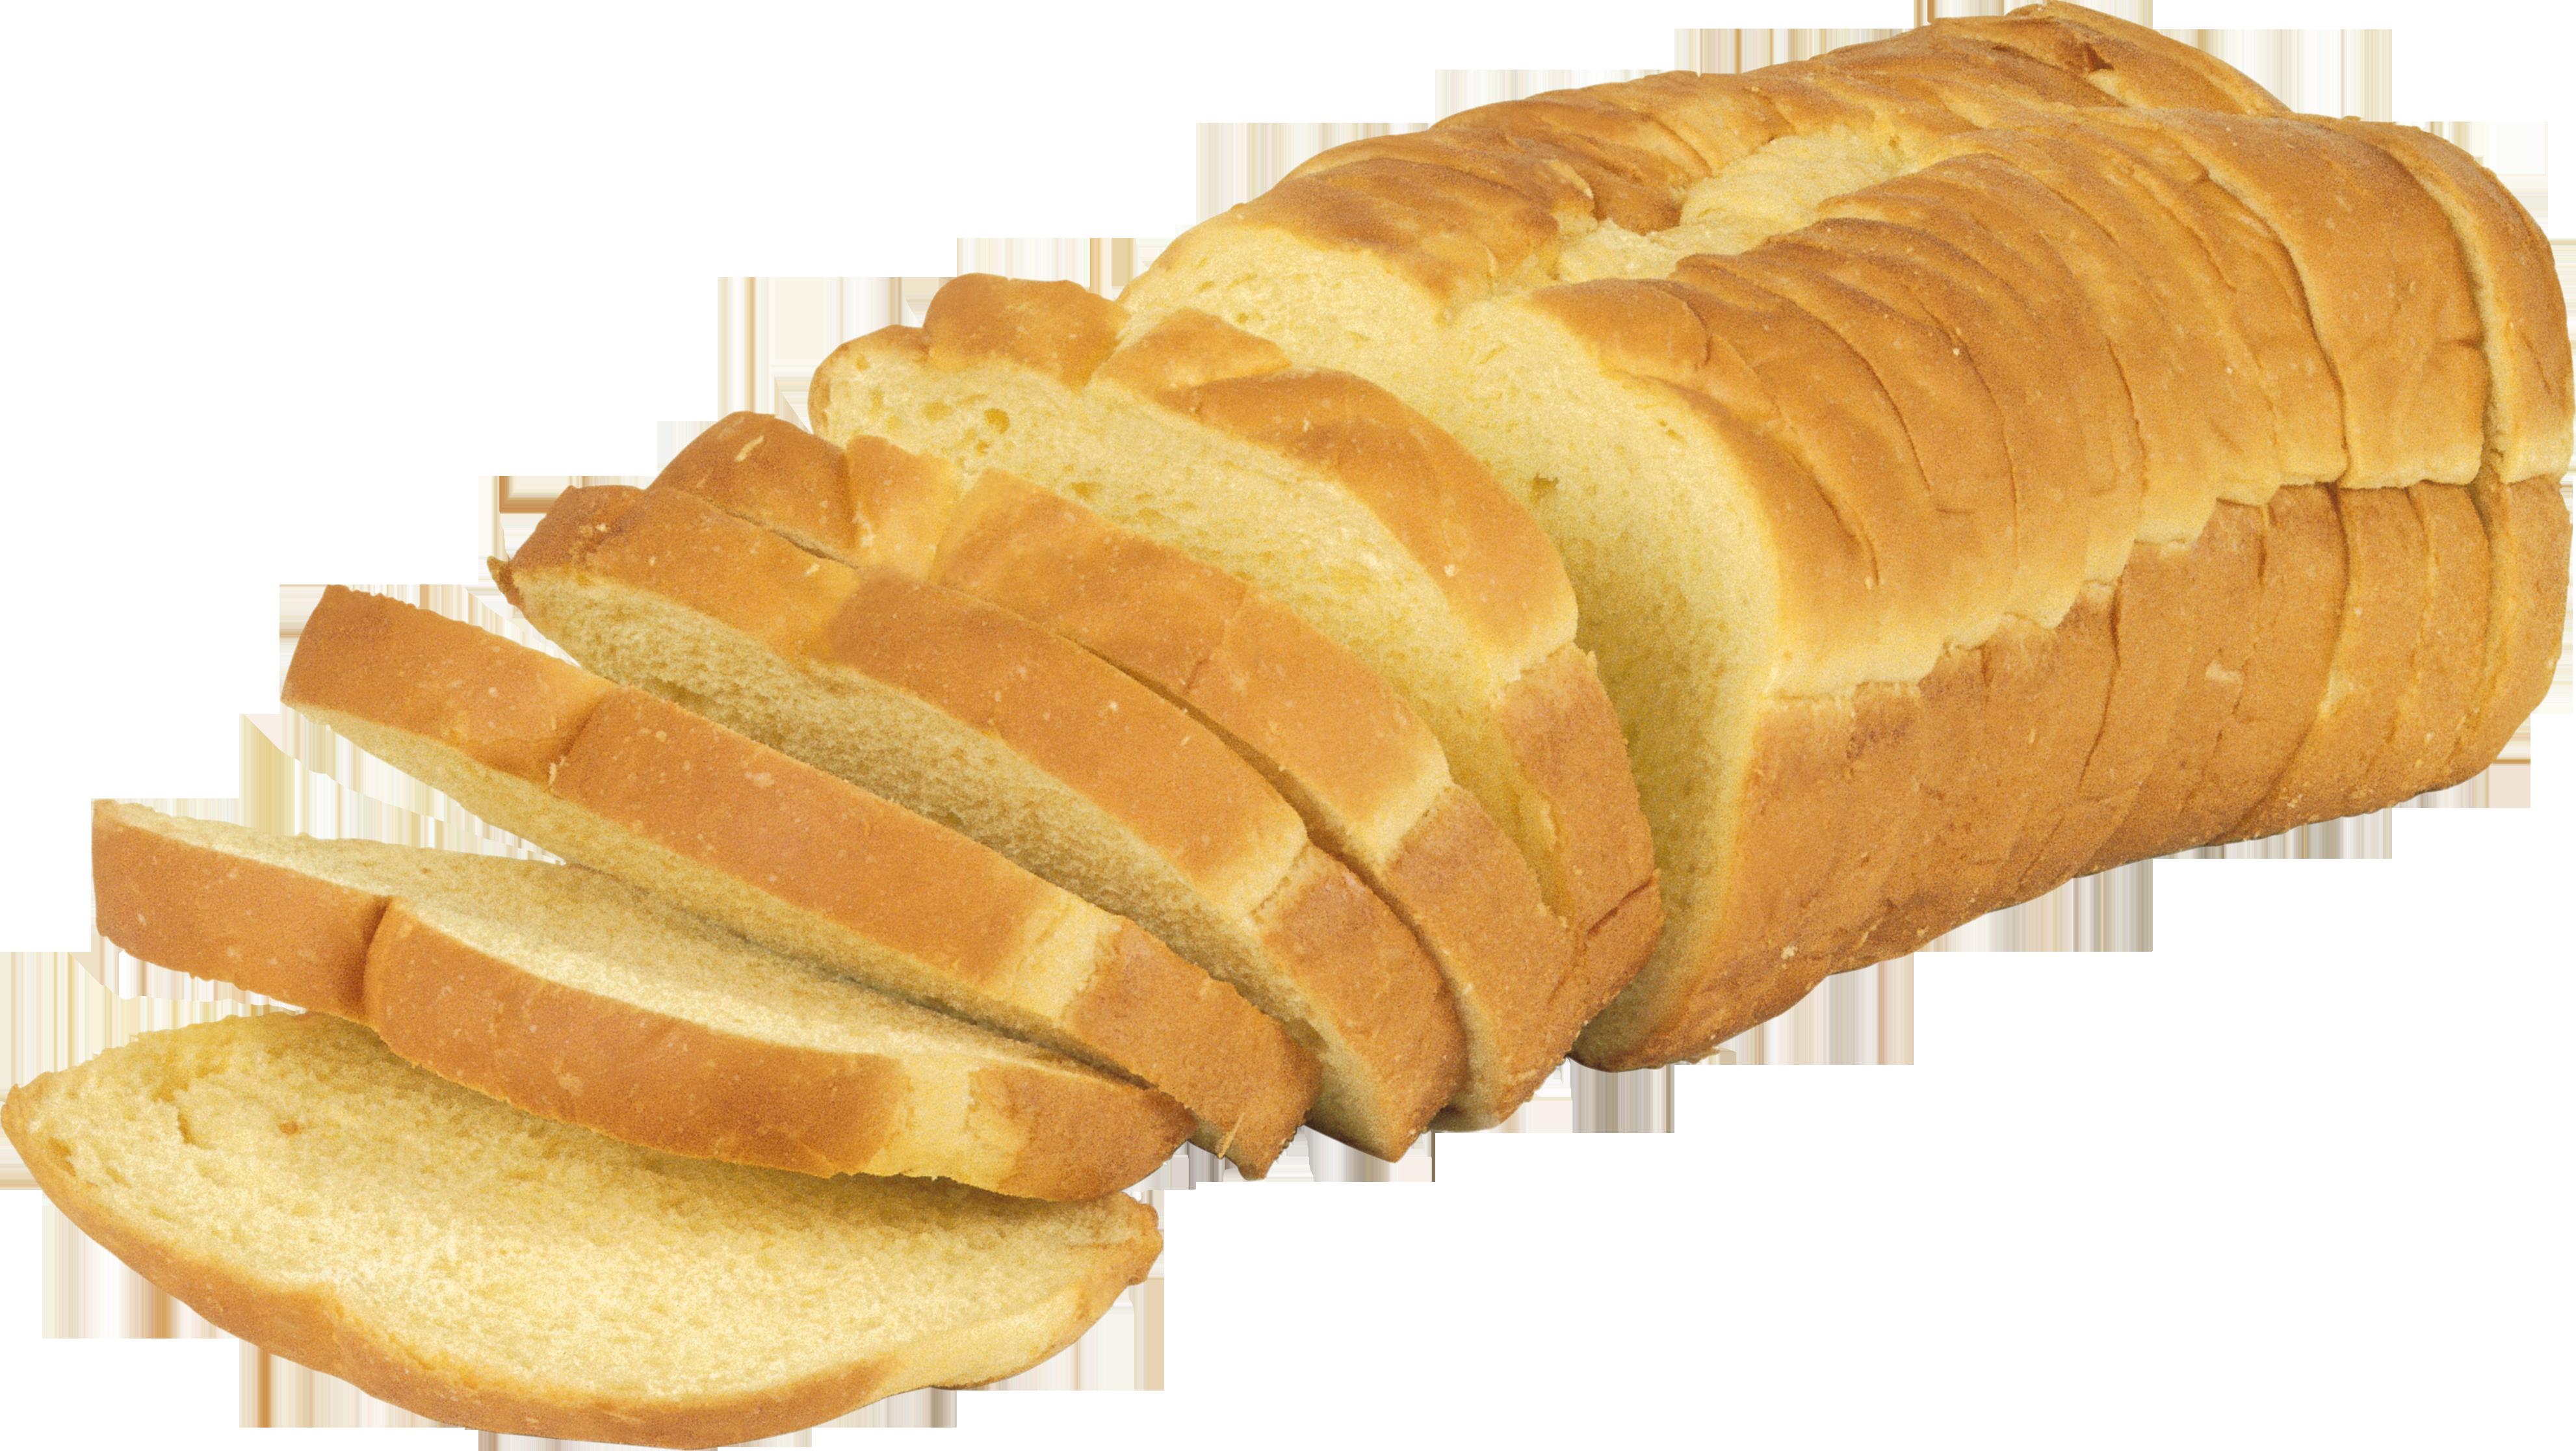 Hd png transparent images. Clipart bread sandwich bread